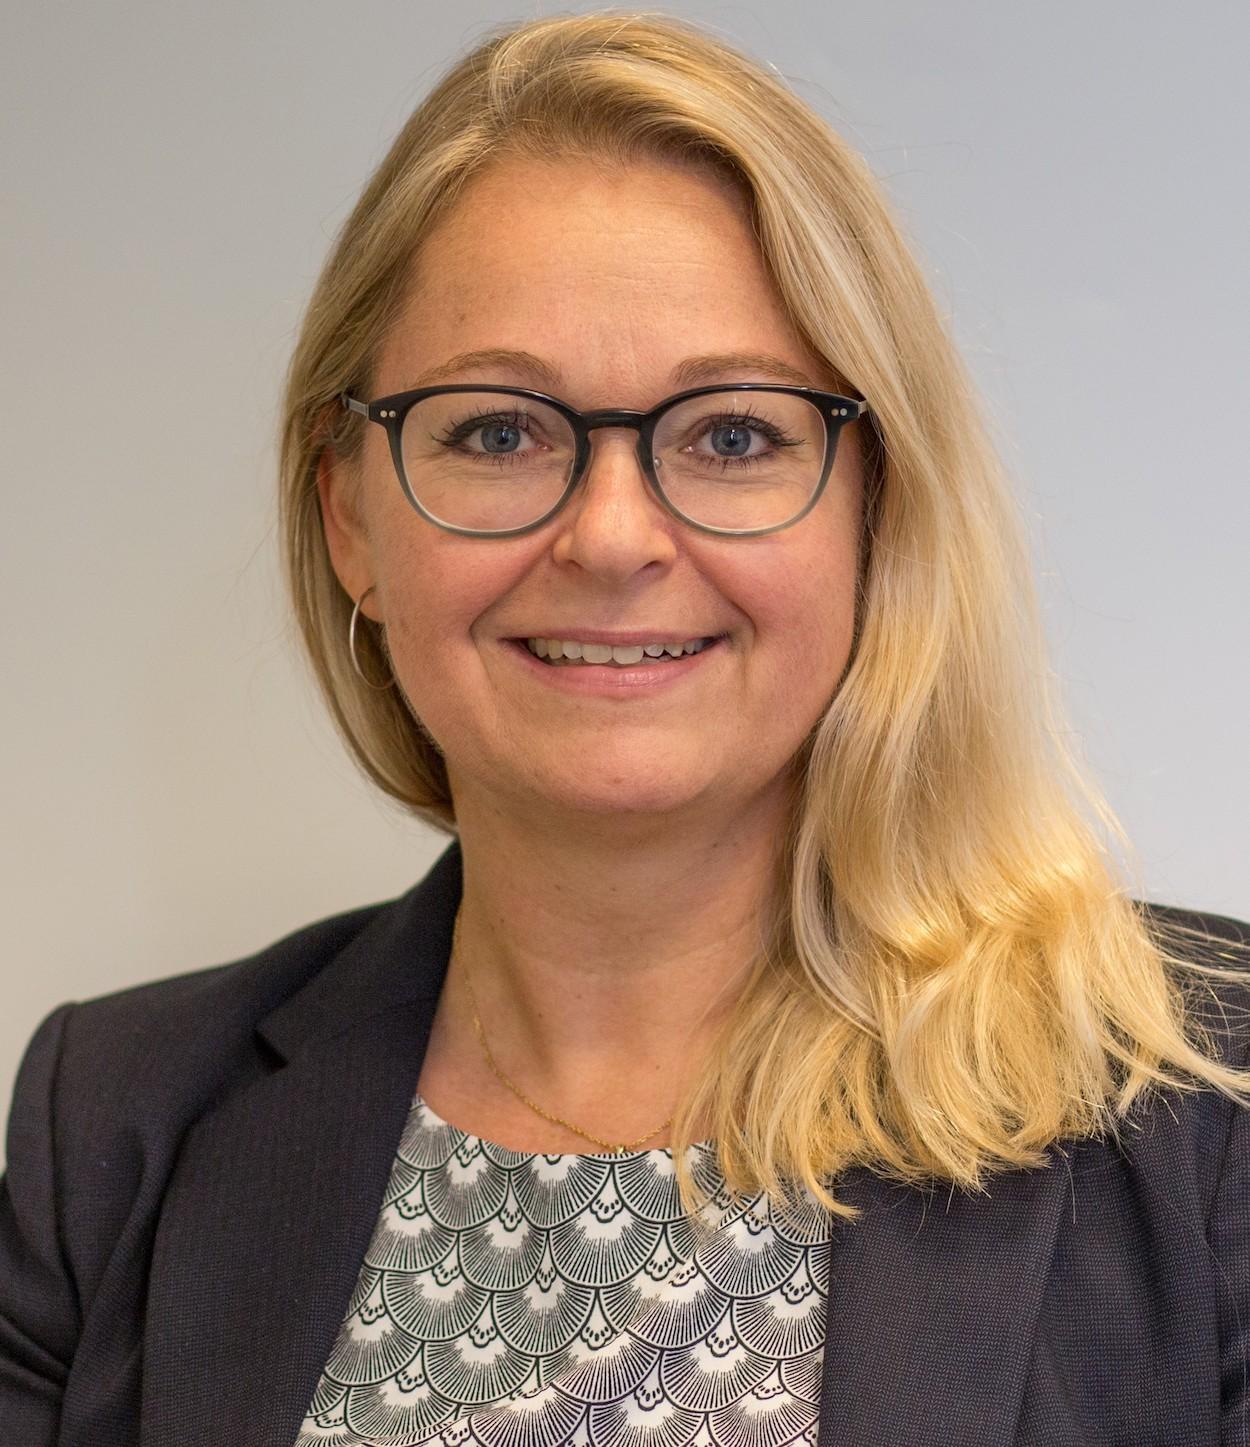 Solveig Nygaard Sørensen